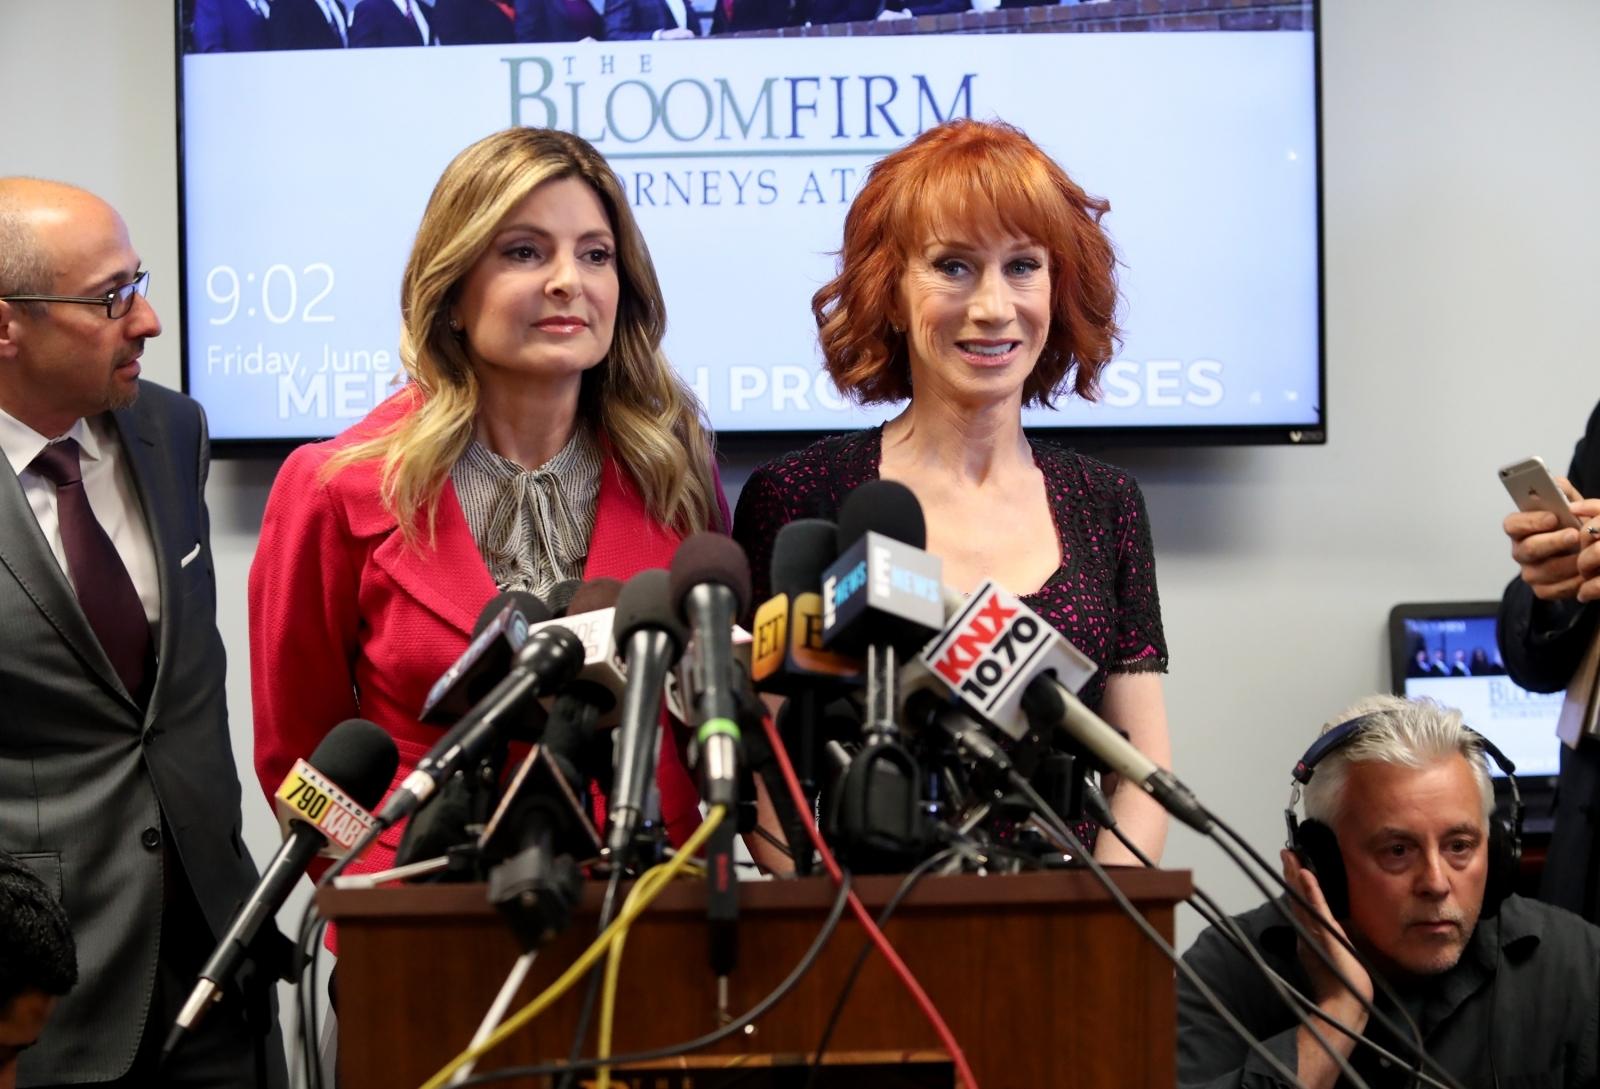 Lisa Bloom, Kathy Griffin